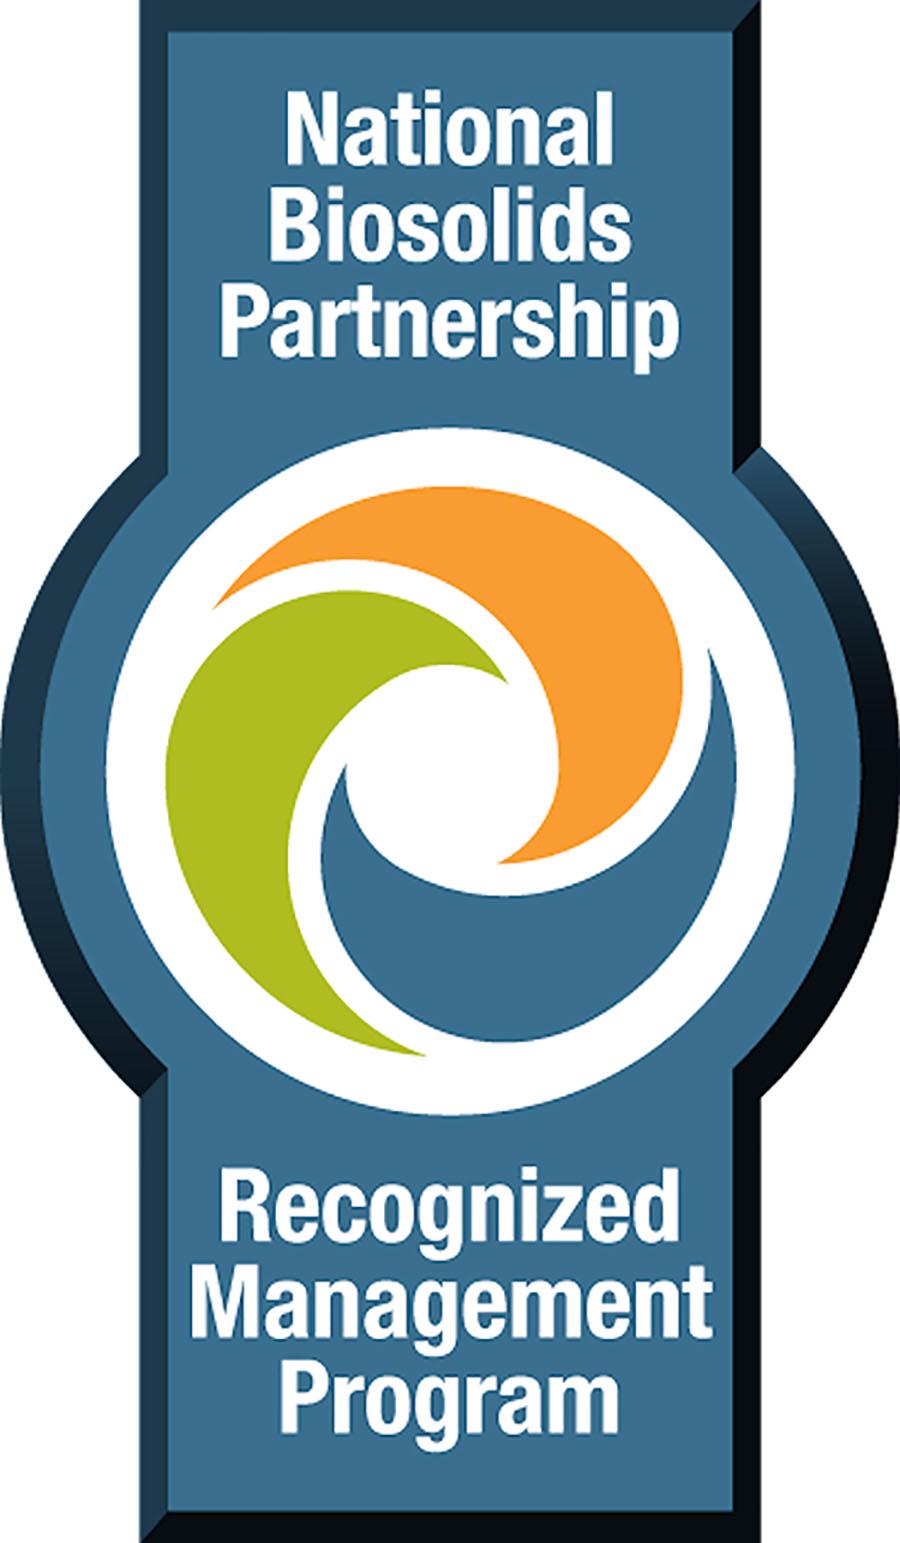 National Biosolids Partnership